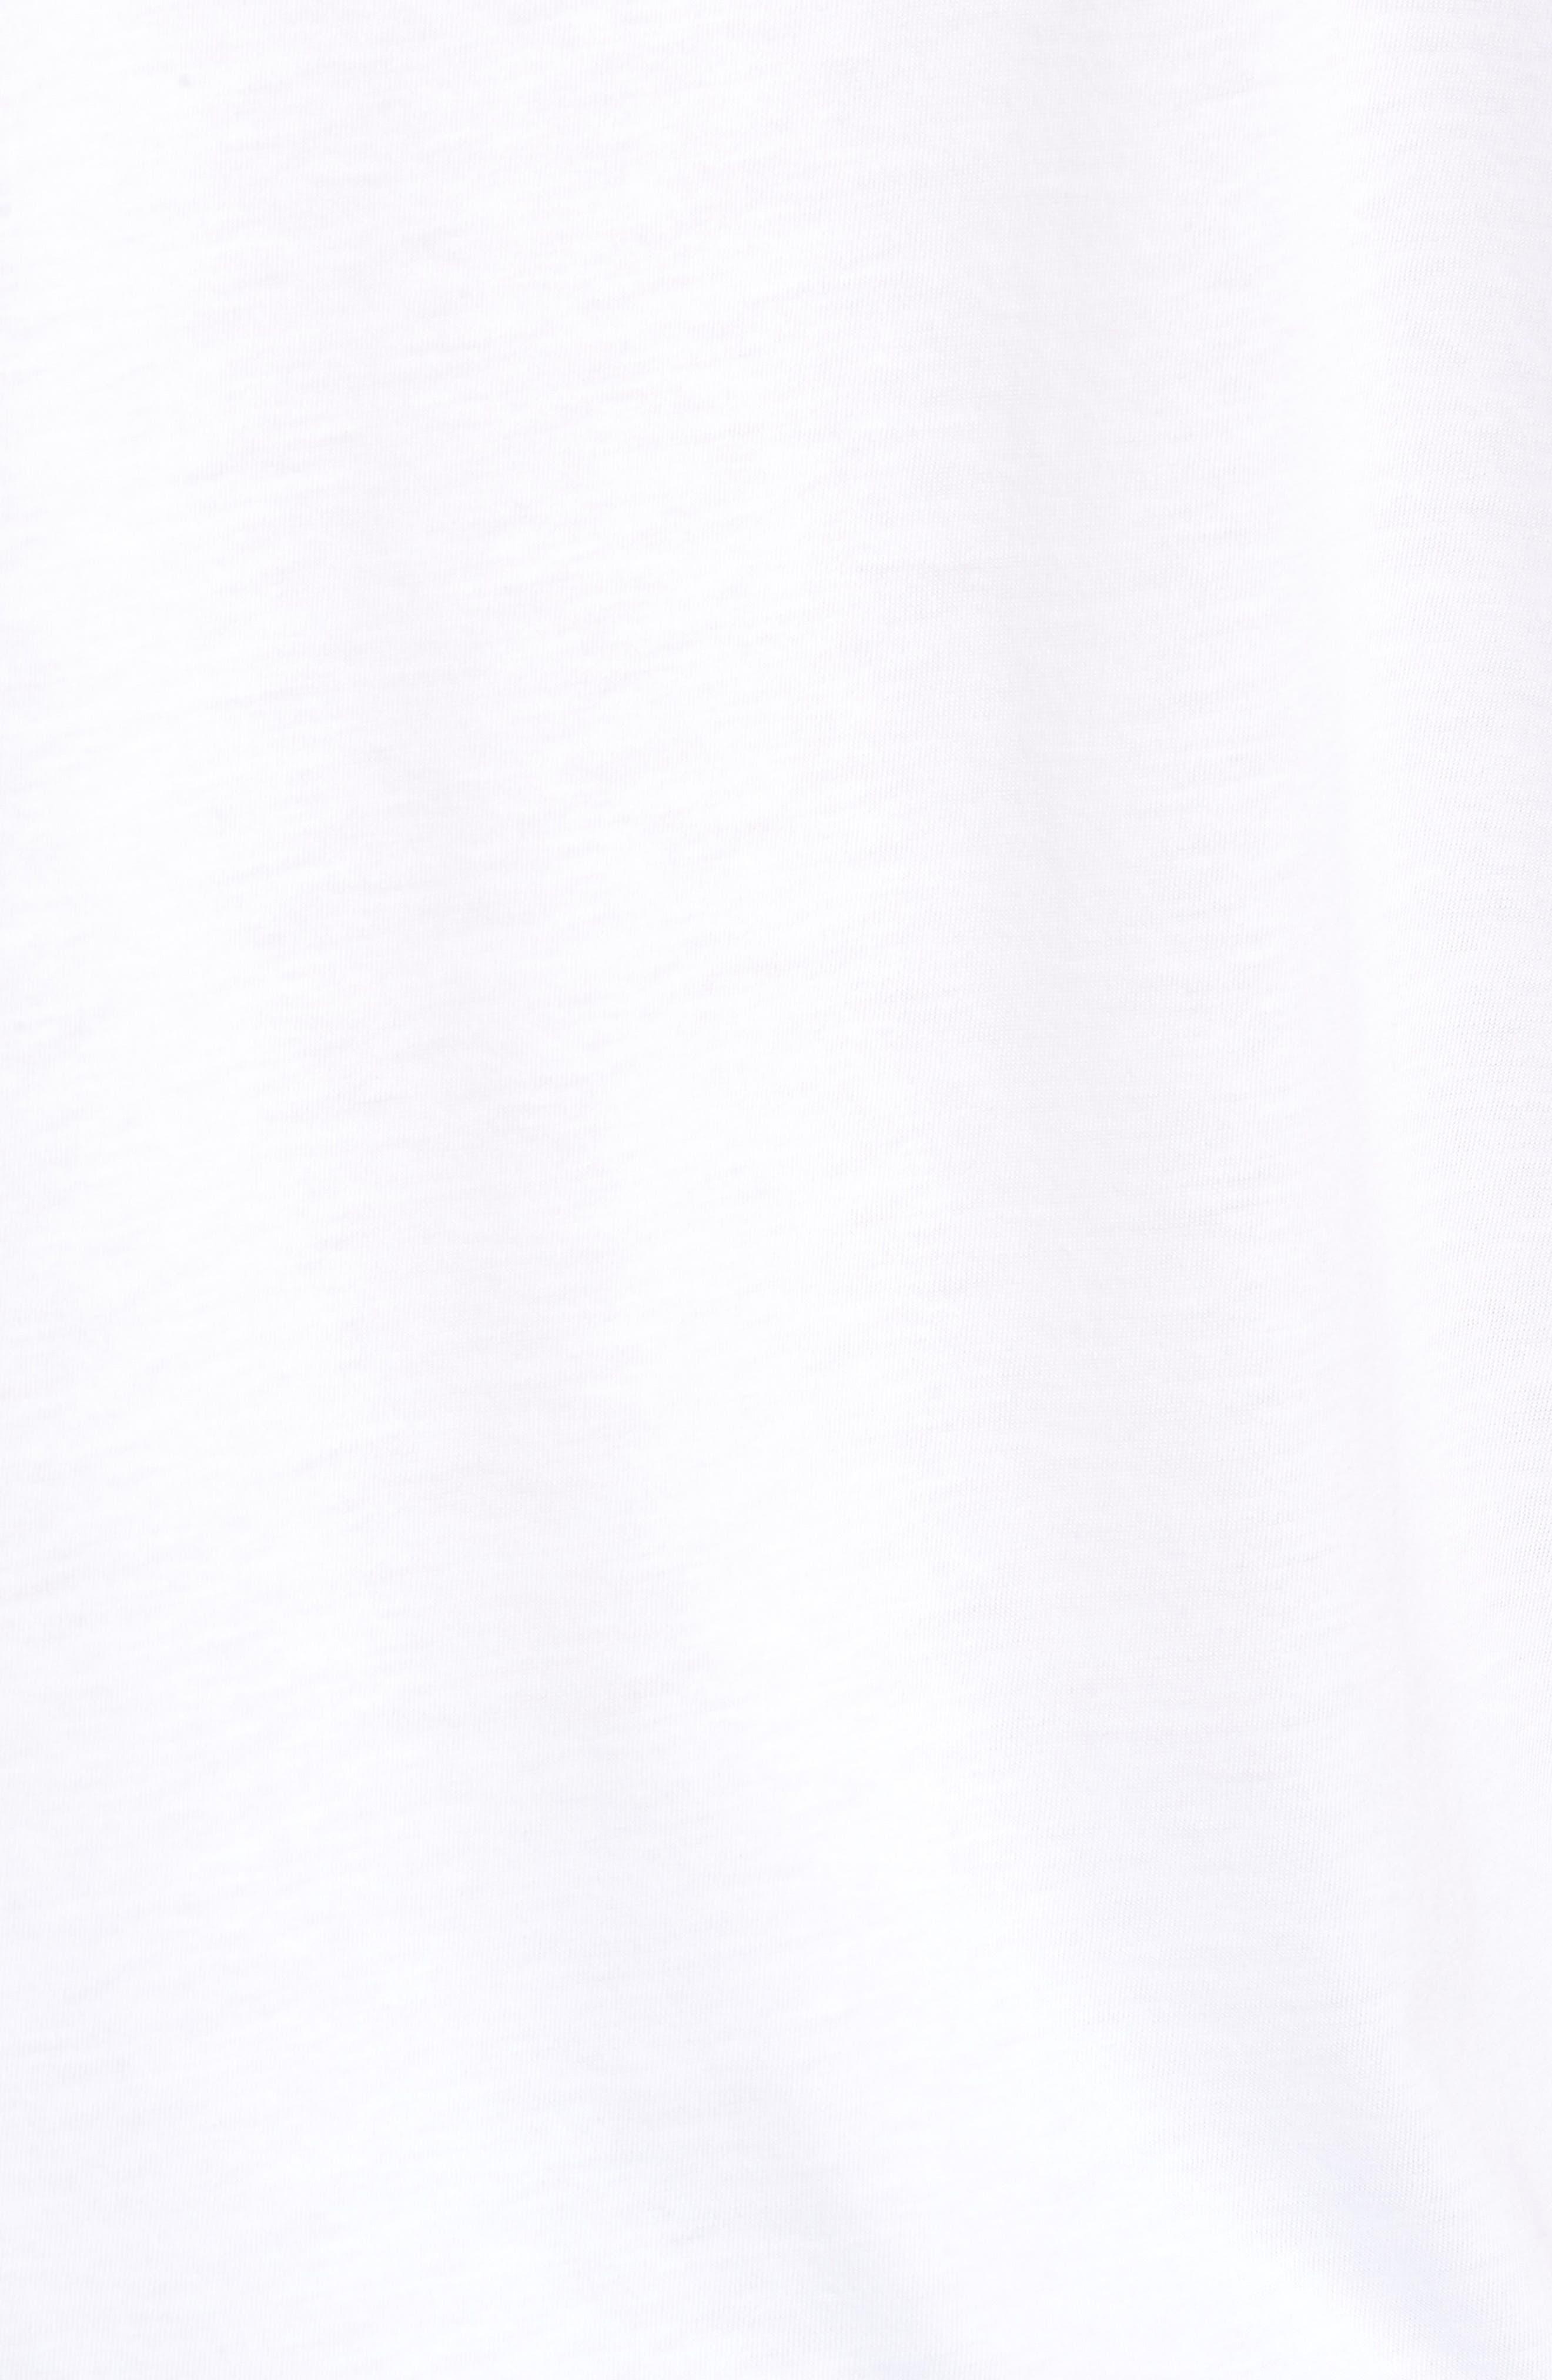 Muska Pocket T-Shirt,                             Alternate thumbnail 5, color,                             100